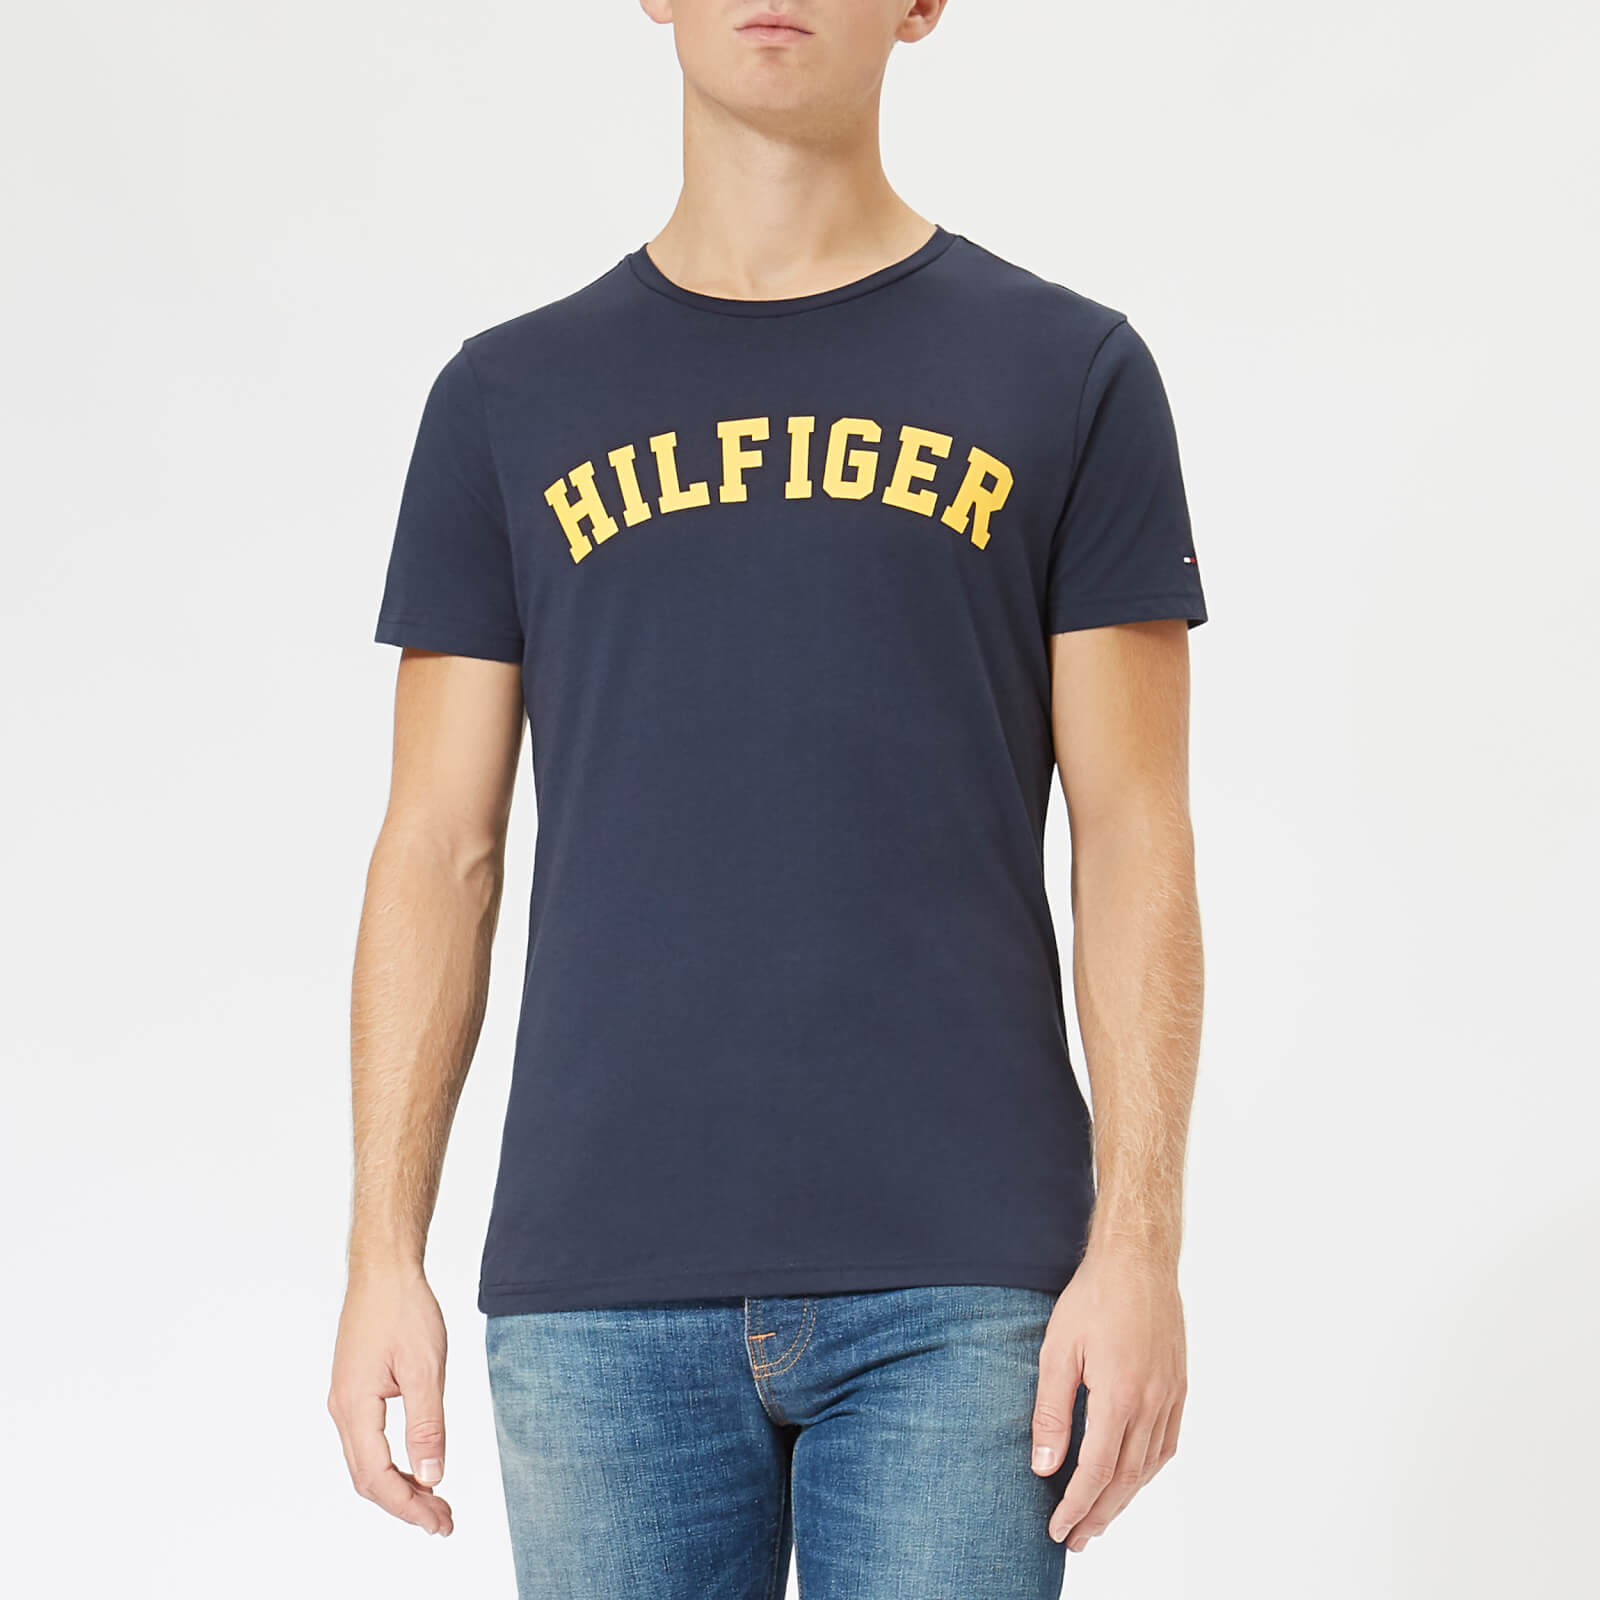 aed3c4ad Tommy Hilfiger Men's Short Sleeve Logo T-Shirt - Navy/Citrus Clothing |  TheHut.com